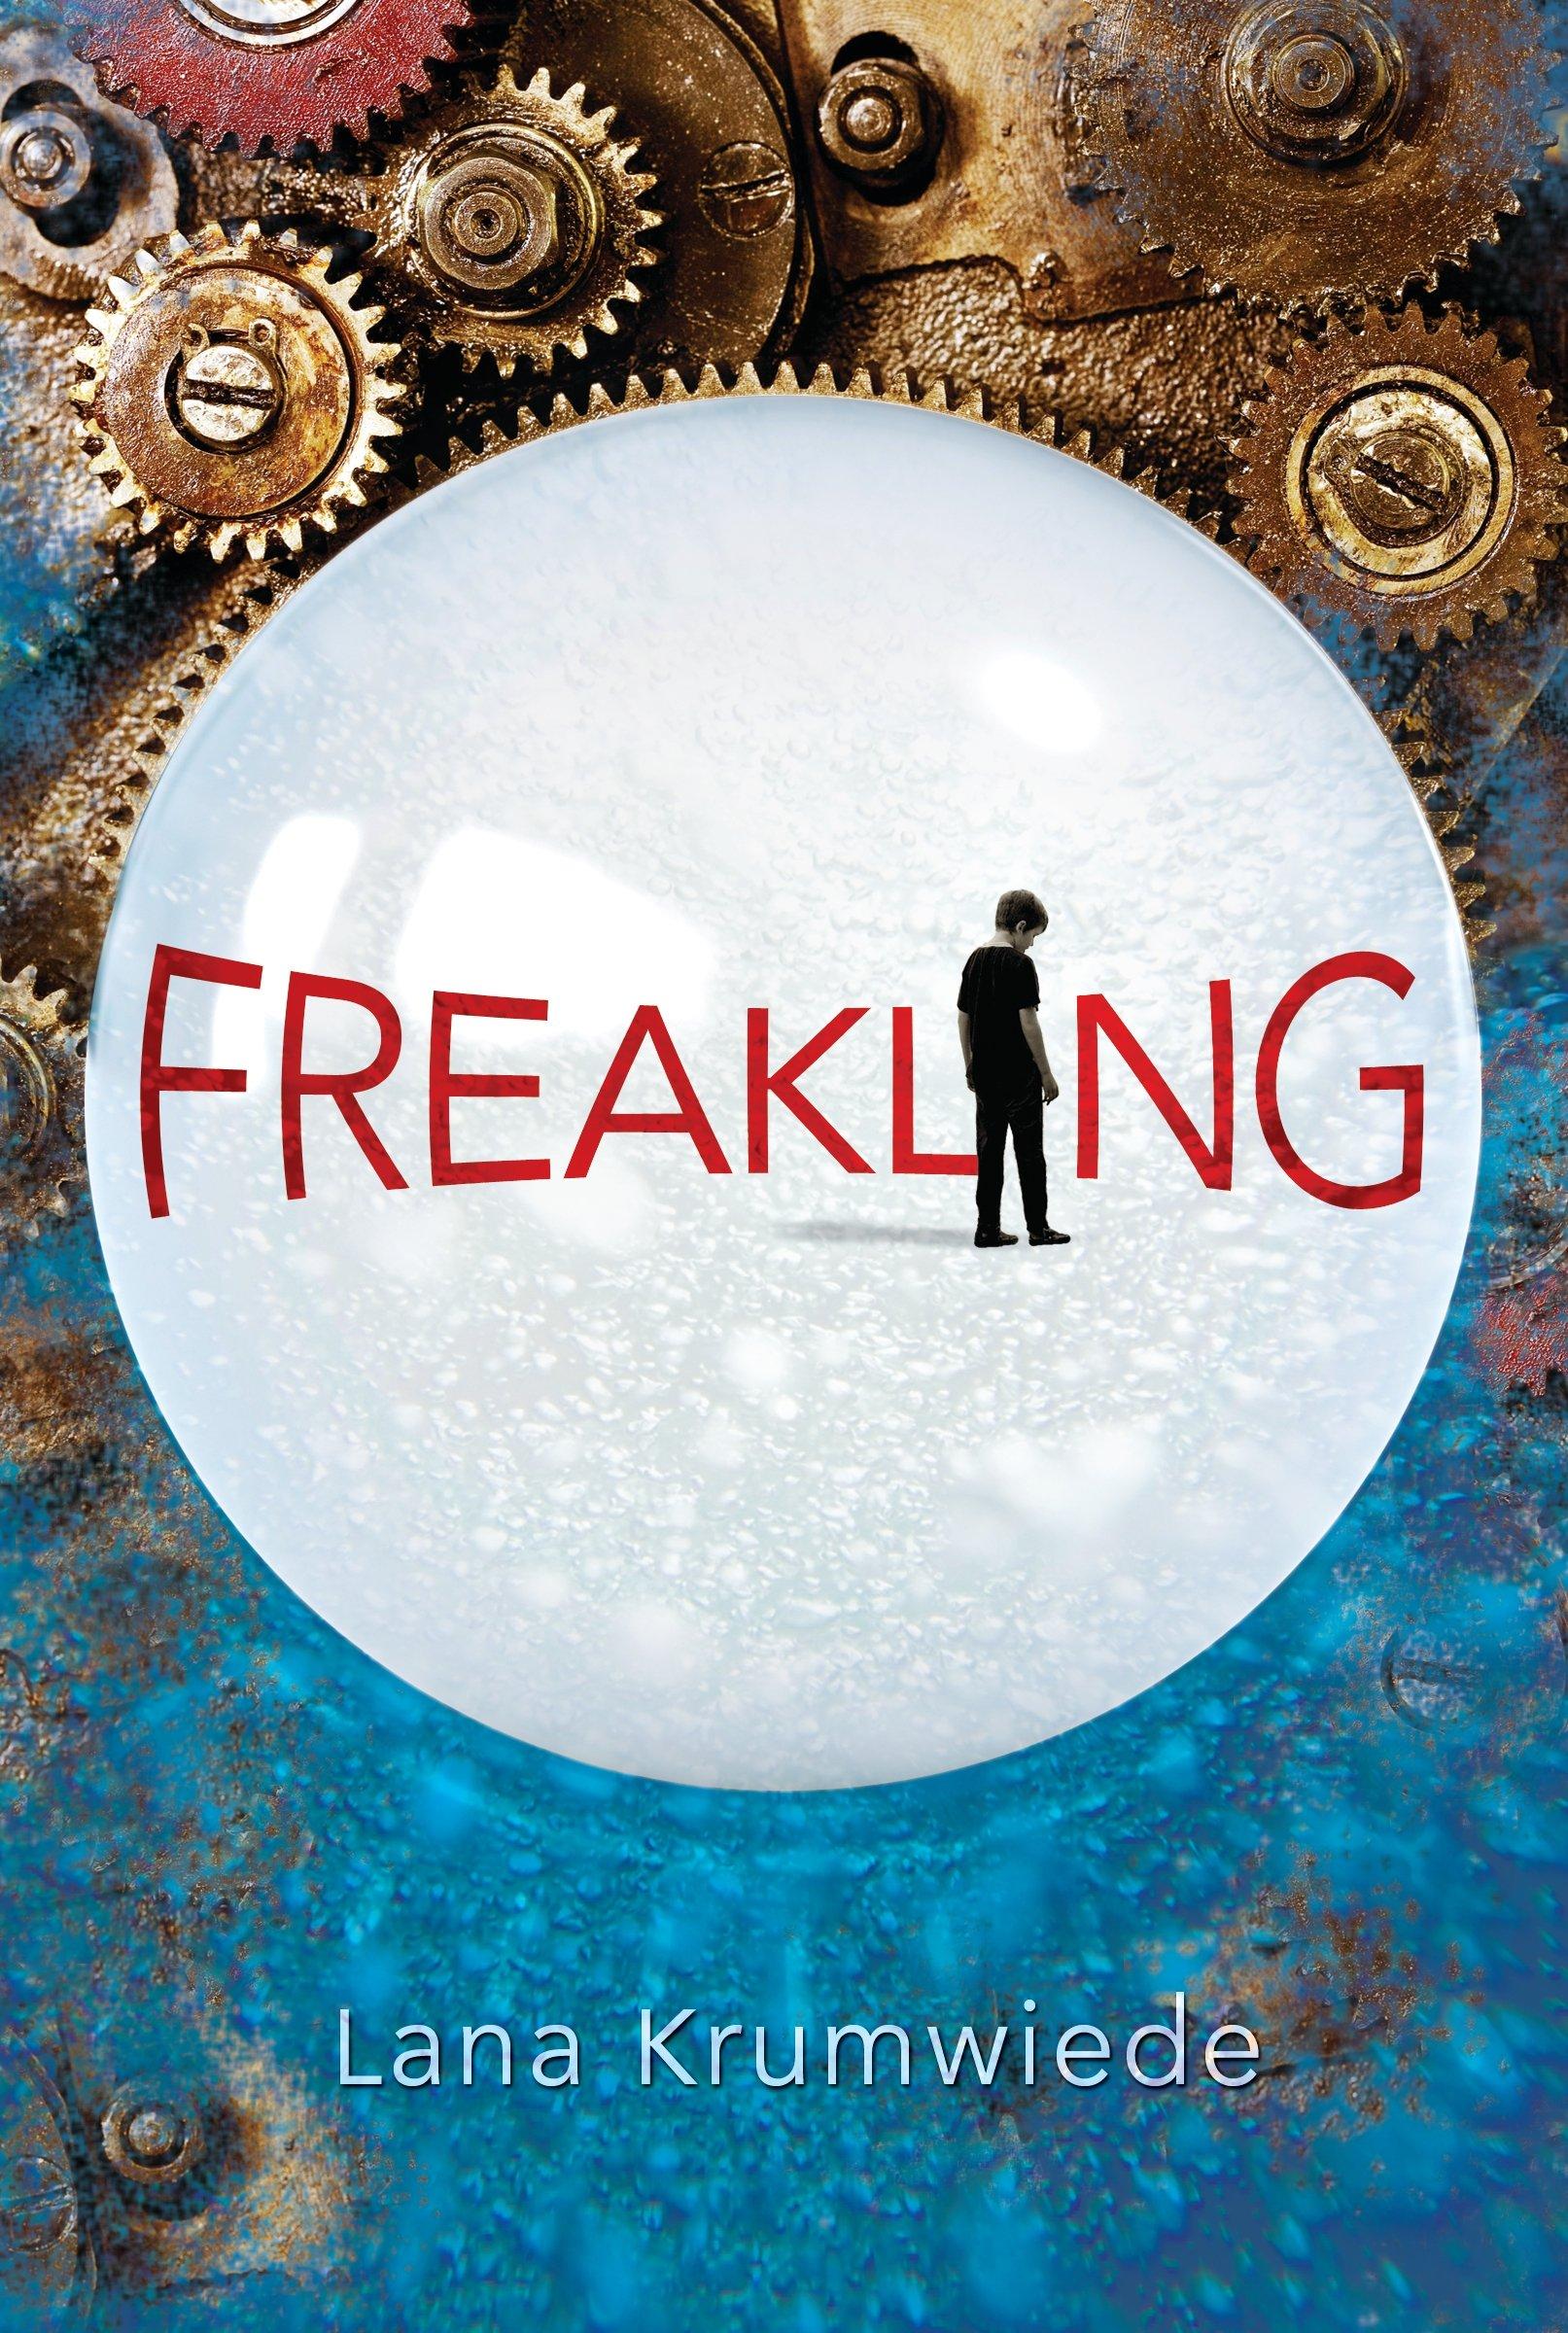 Download Freakling (Psi Chronicles) PDF ePub book